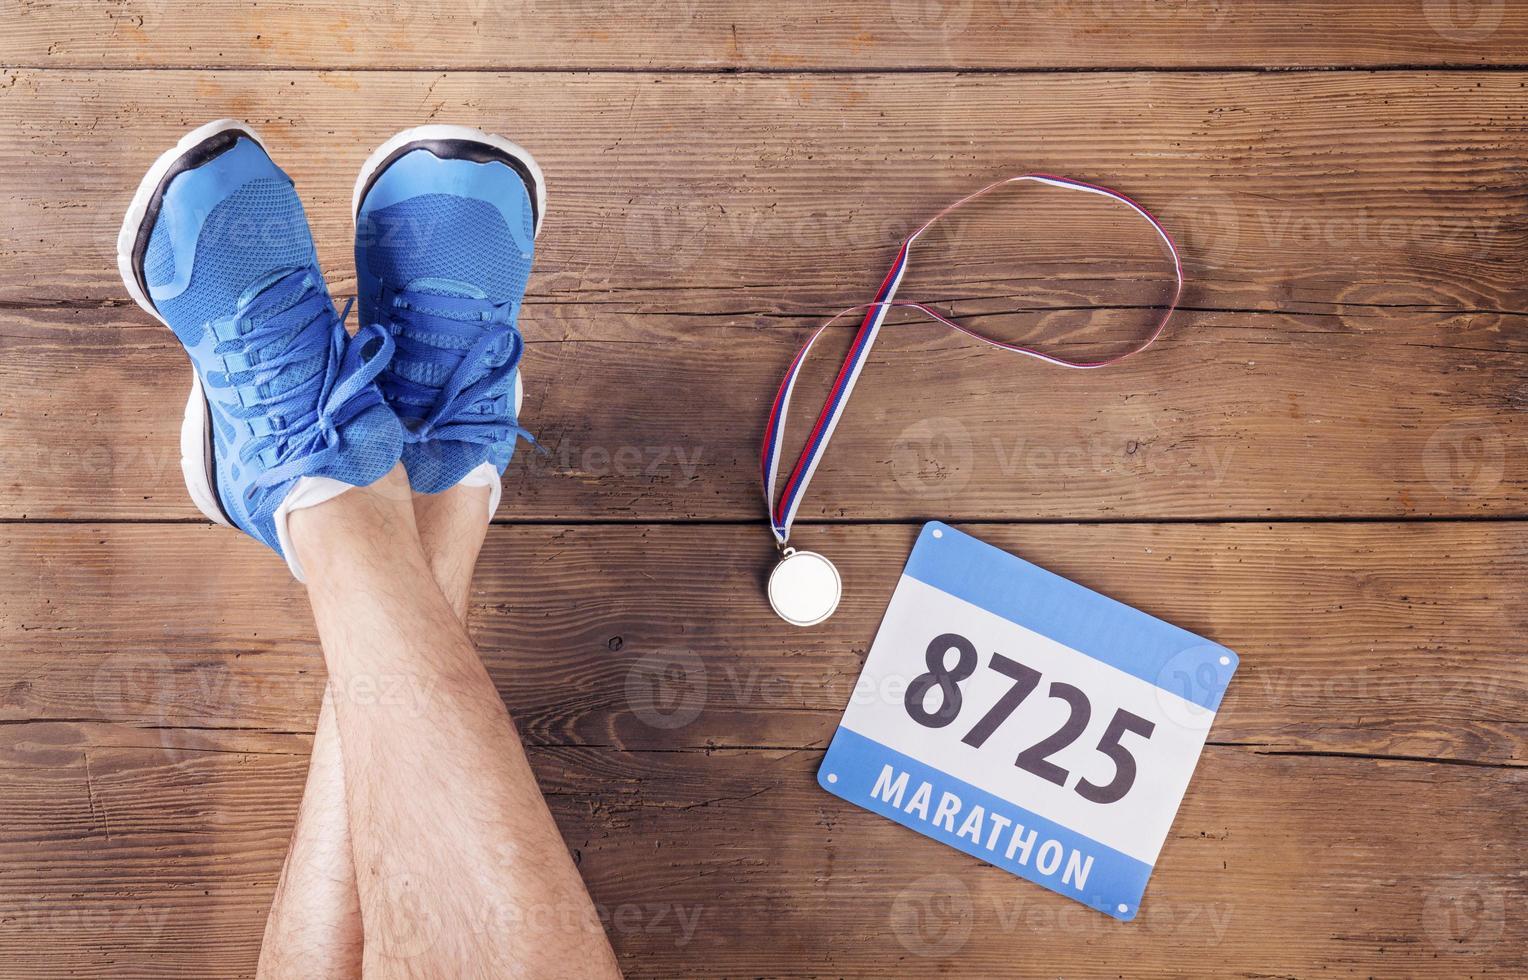 corredor de maratona masculino bem sucedido foto